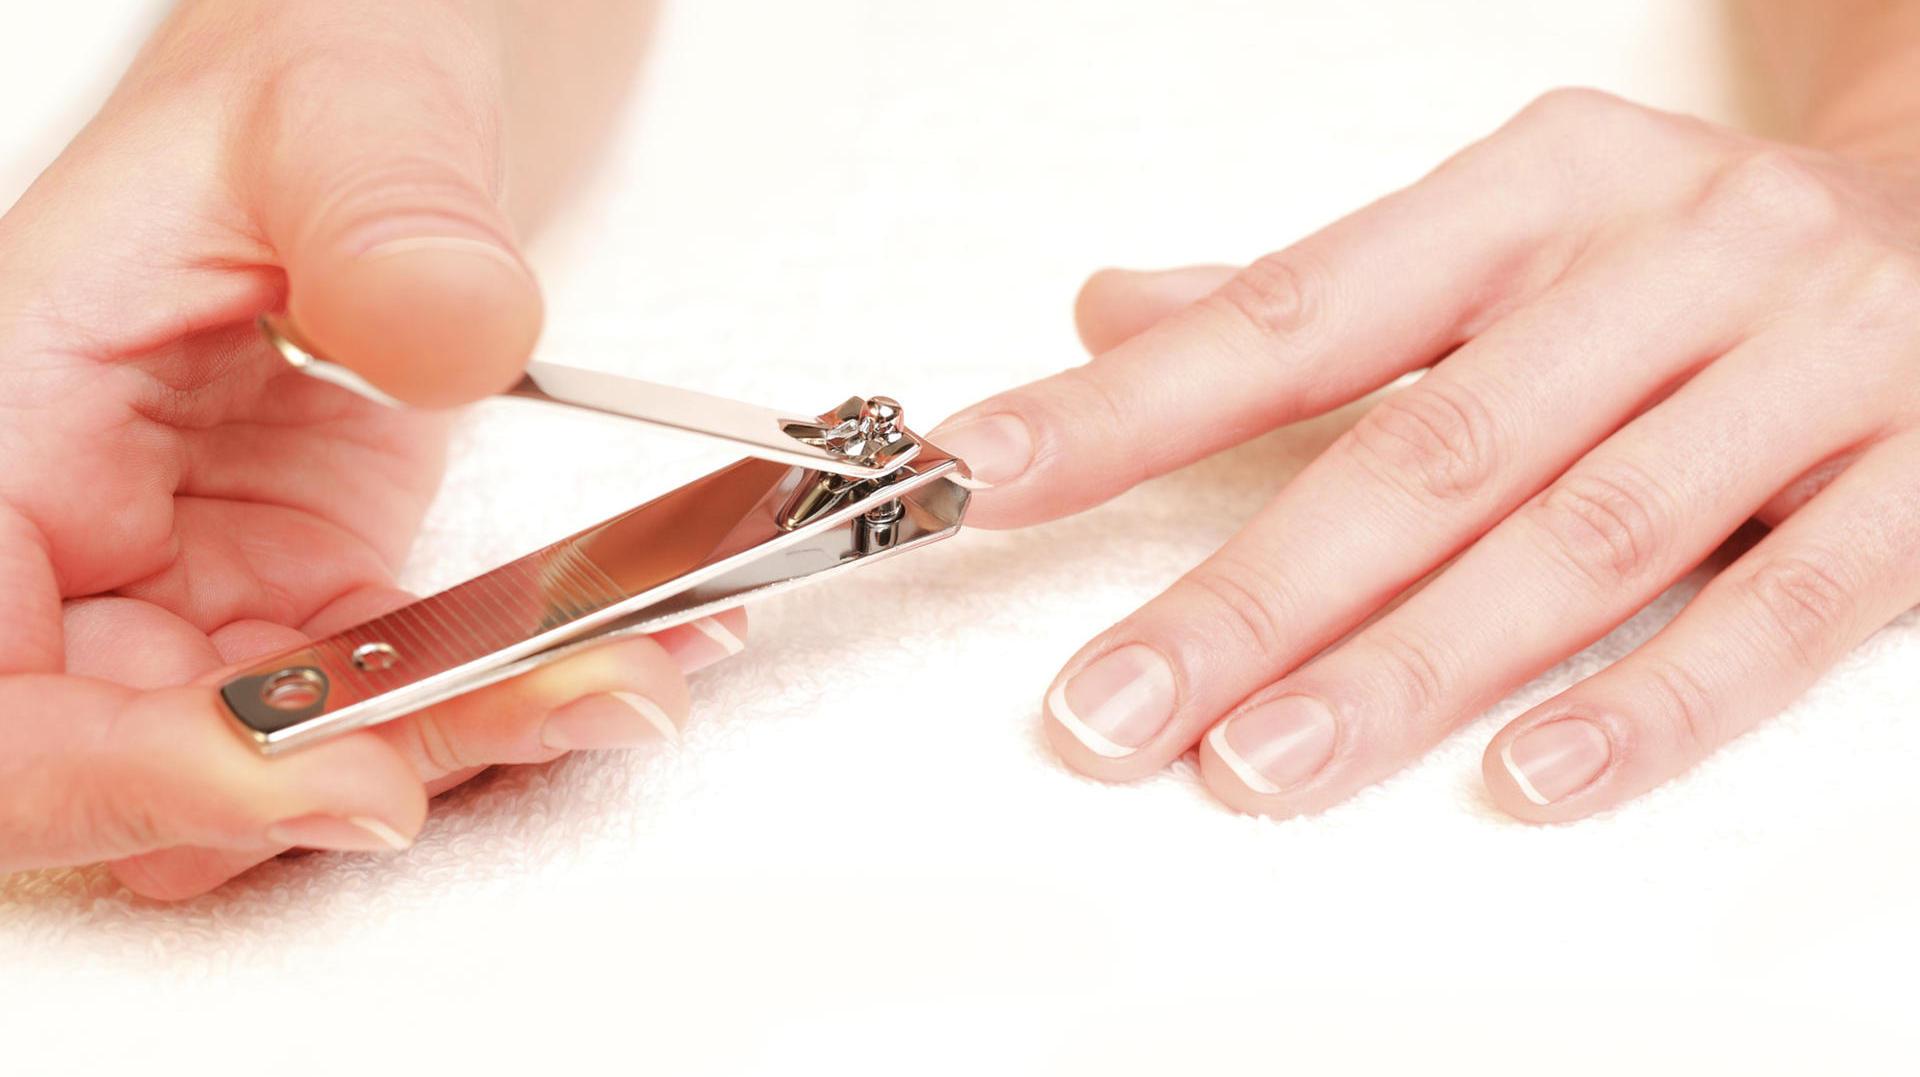 стричь ногти